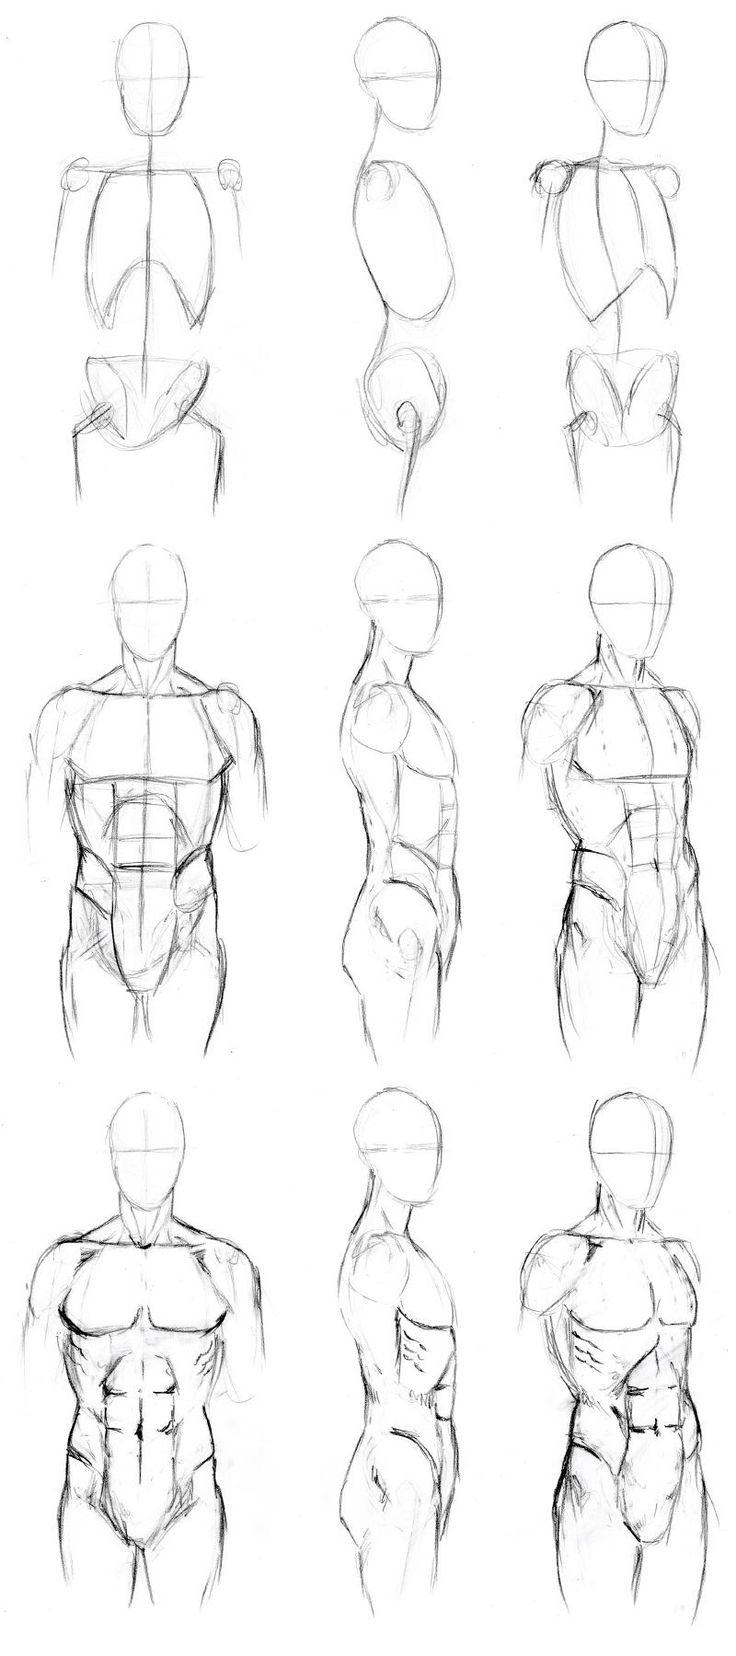 Basic Male Torso Tutorial By Timflanagan On Deviantart Step 1